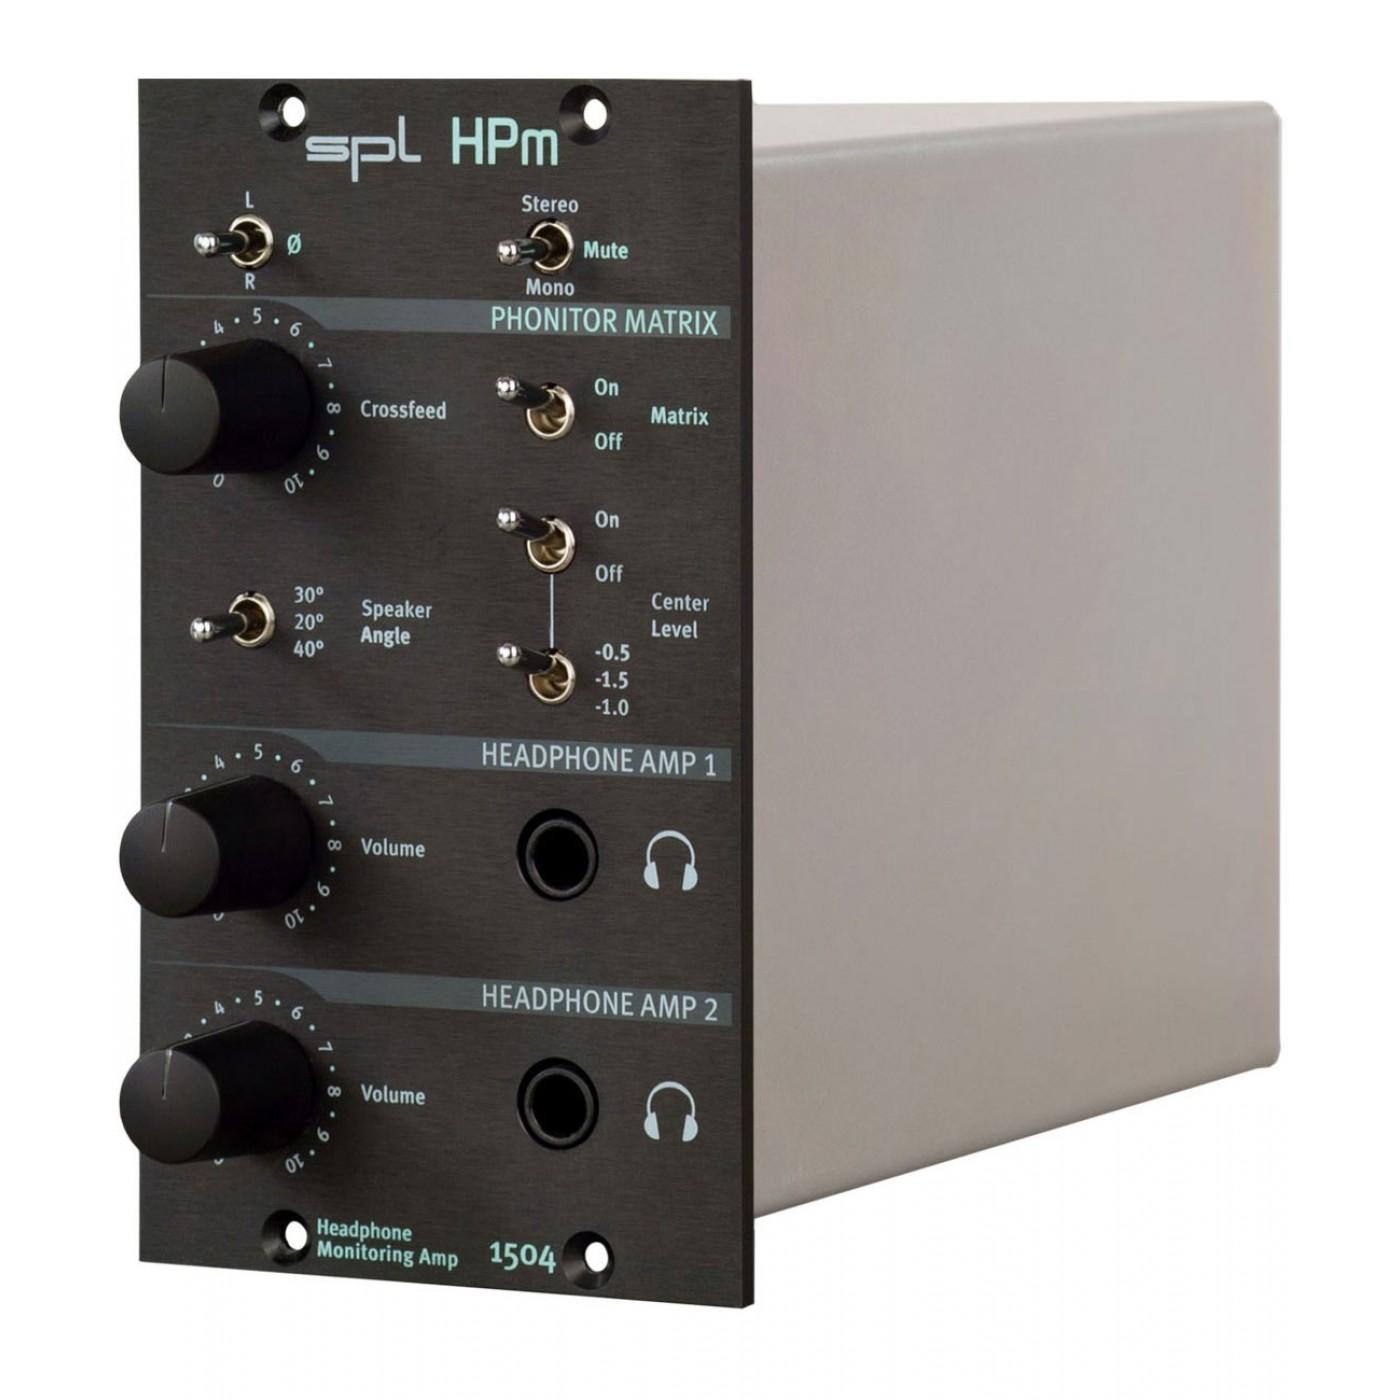 SPL HPm | Rage Audio